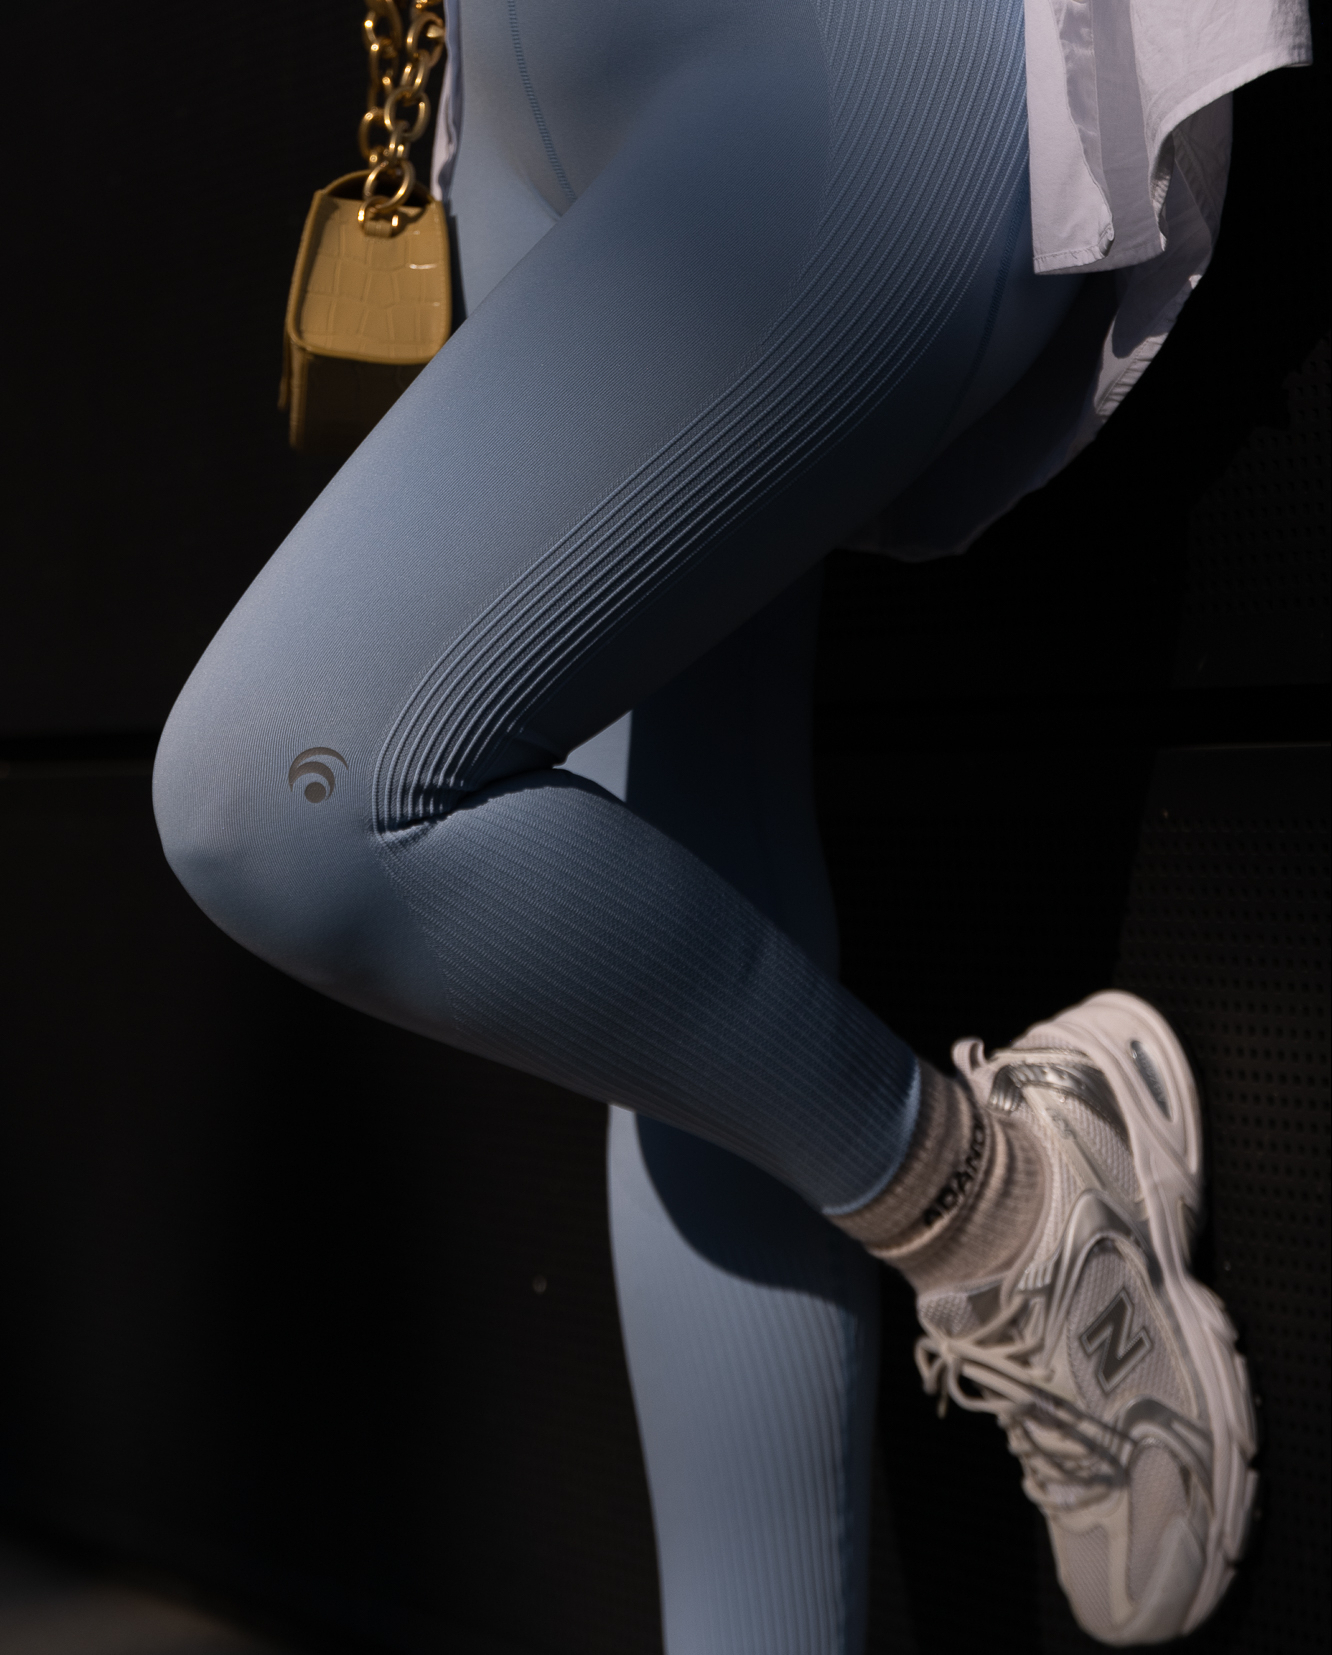 athleisure-outfits-trenchcoat-sneaker-new-balance-aline-kaplan-modeblog-berlin-1